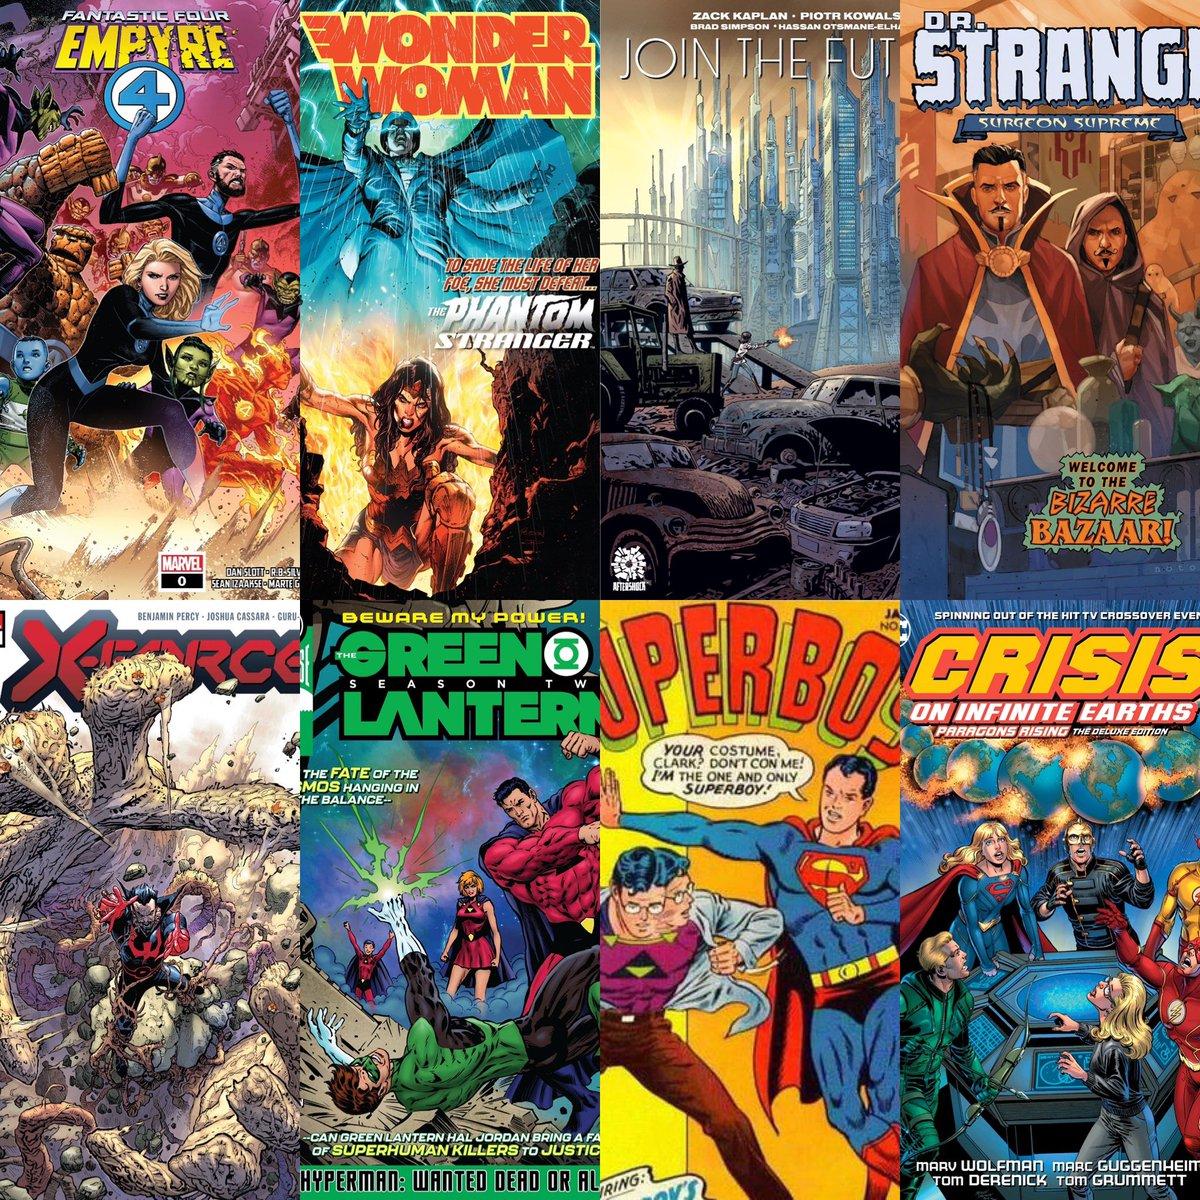 Lecturas del día #comicbook #superhero #comic #comicart #superheroes #comicbookart #comicpanel #comicbooks #comicbook #comicnerd #comicgeek #dccomics #dc #marvelcomics #comicstrip  #comics #marvel #comic #historieta #dibujos #marvelcomics https://t.co/zOMcgAkxc0